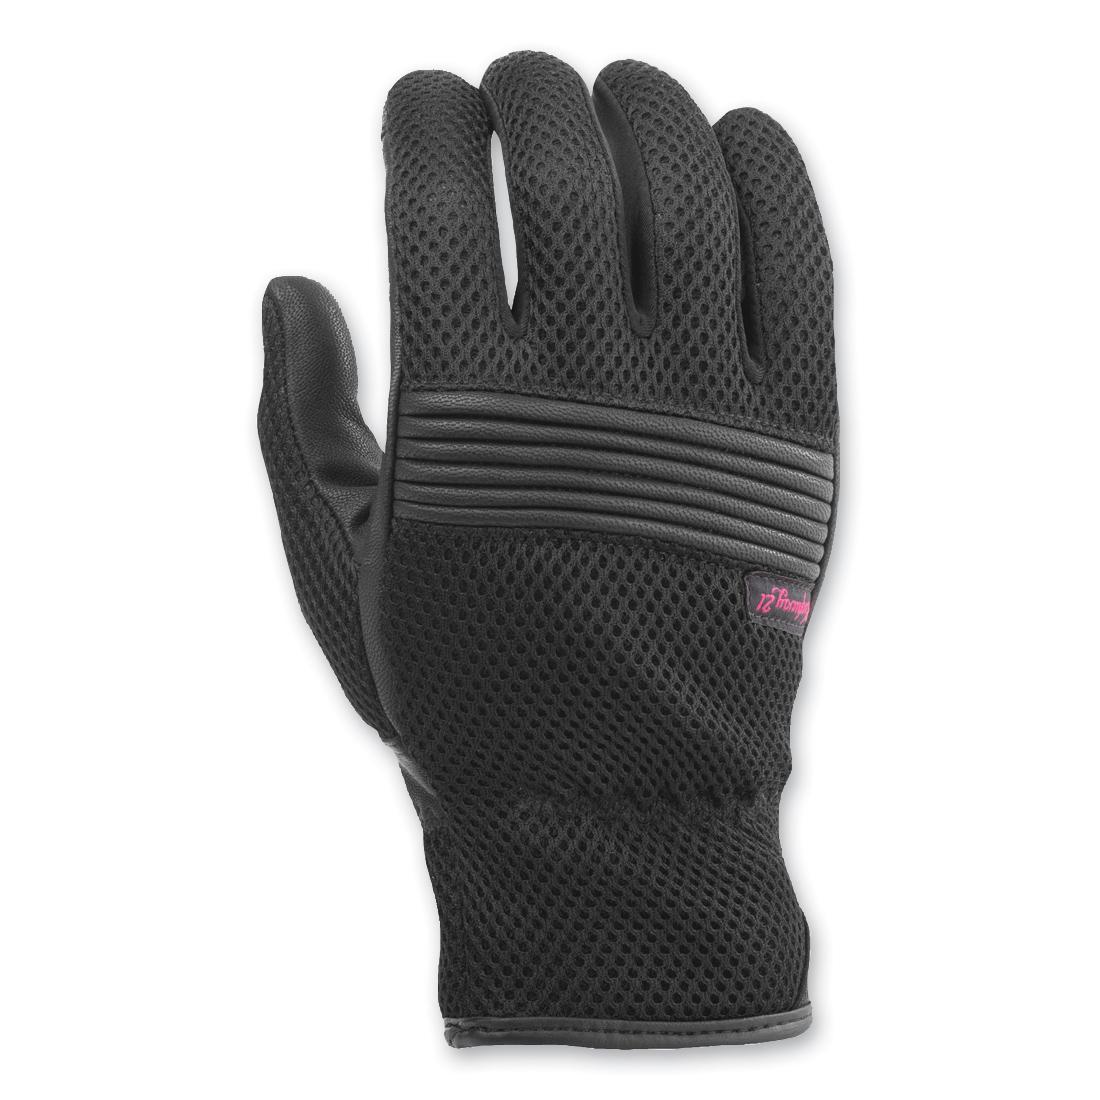 Highway 21 Women's Turbine Black Mesh/Leather Gloves